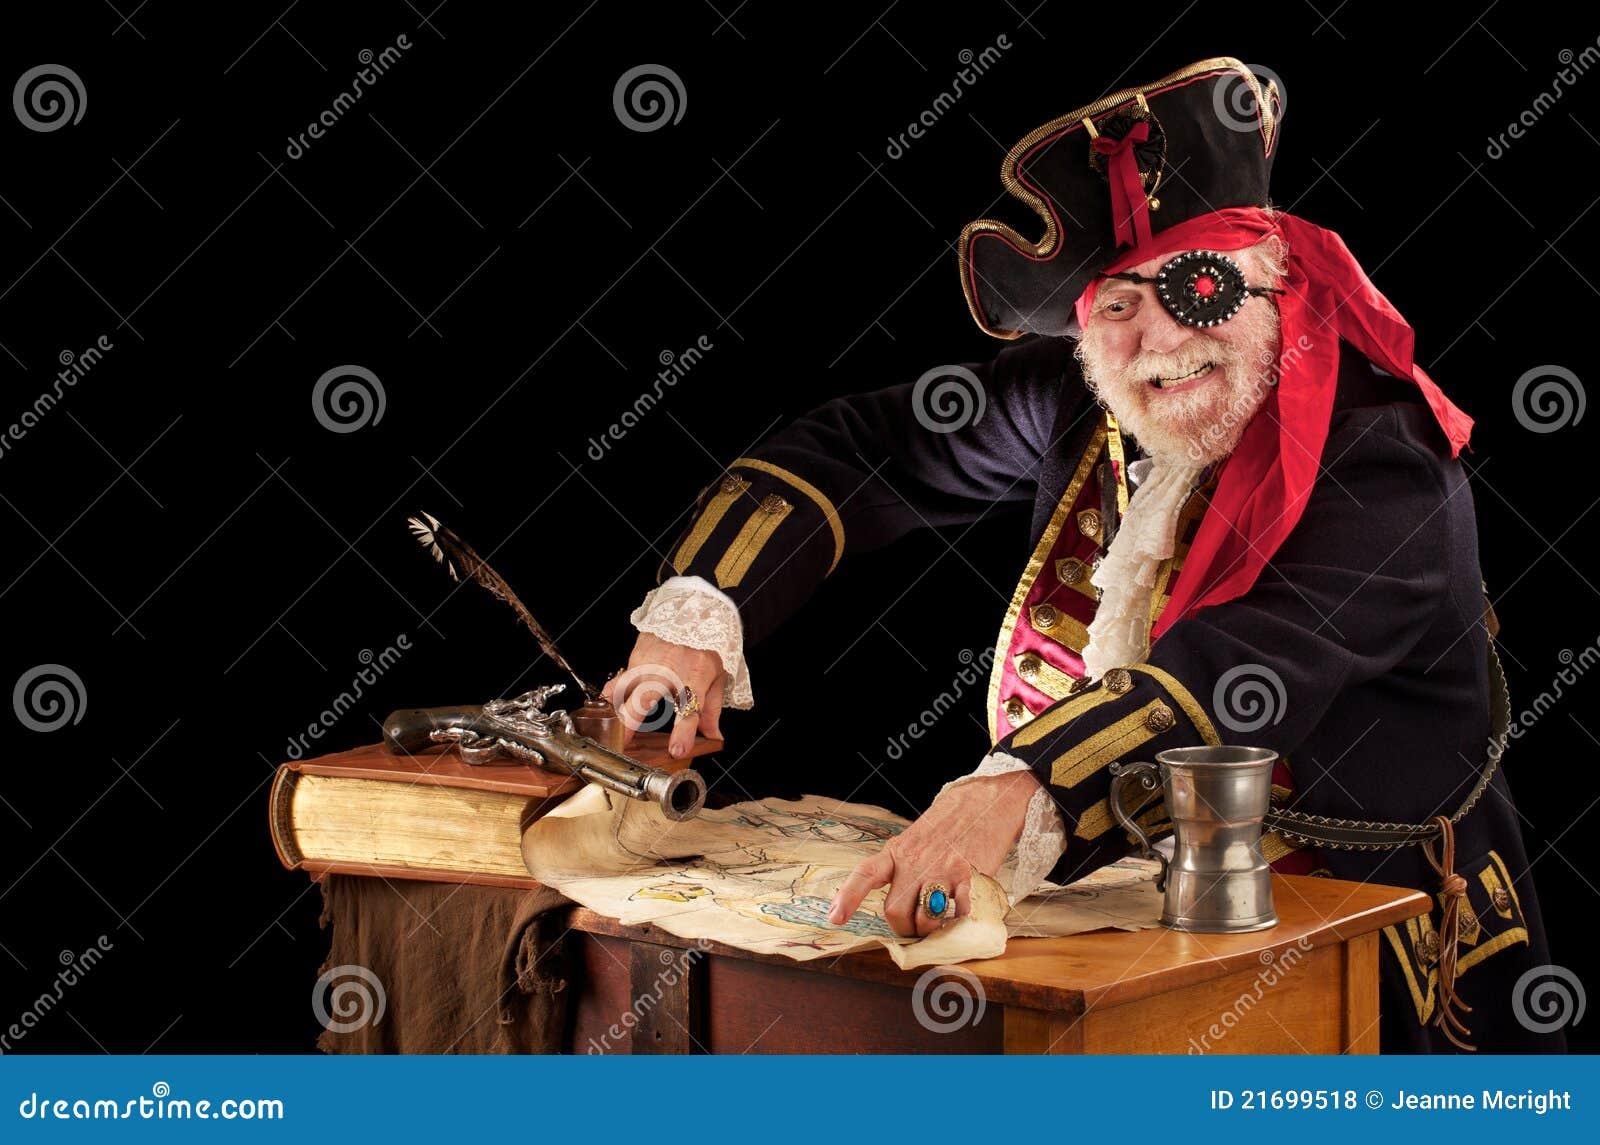 Pirate pointing at his treasure map